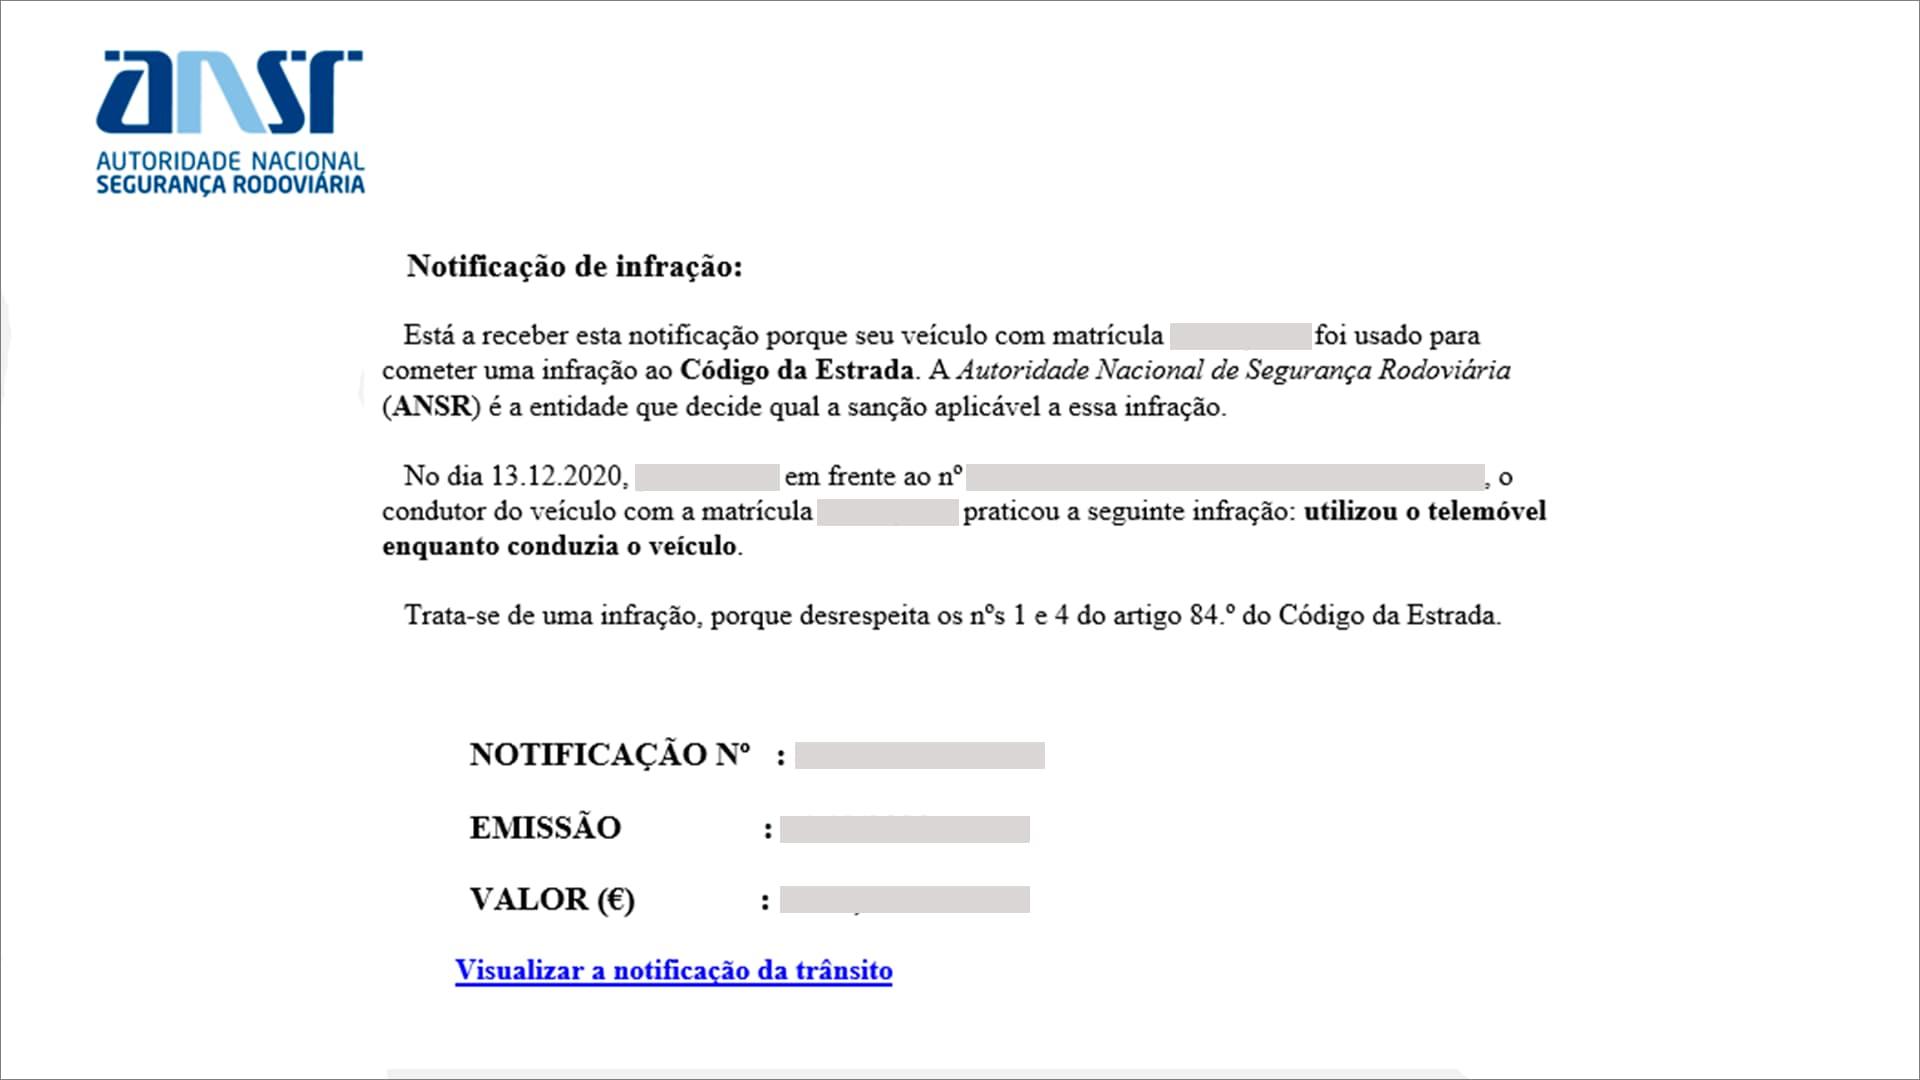 Phishing_Autoridade_Nacional_Segurança_Rodoviária_netSegura